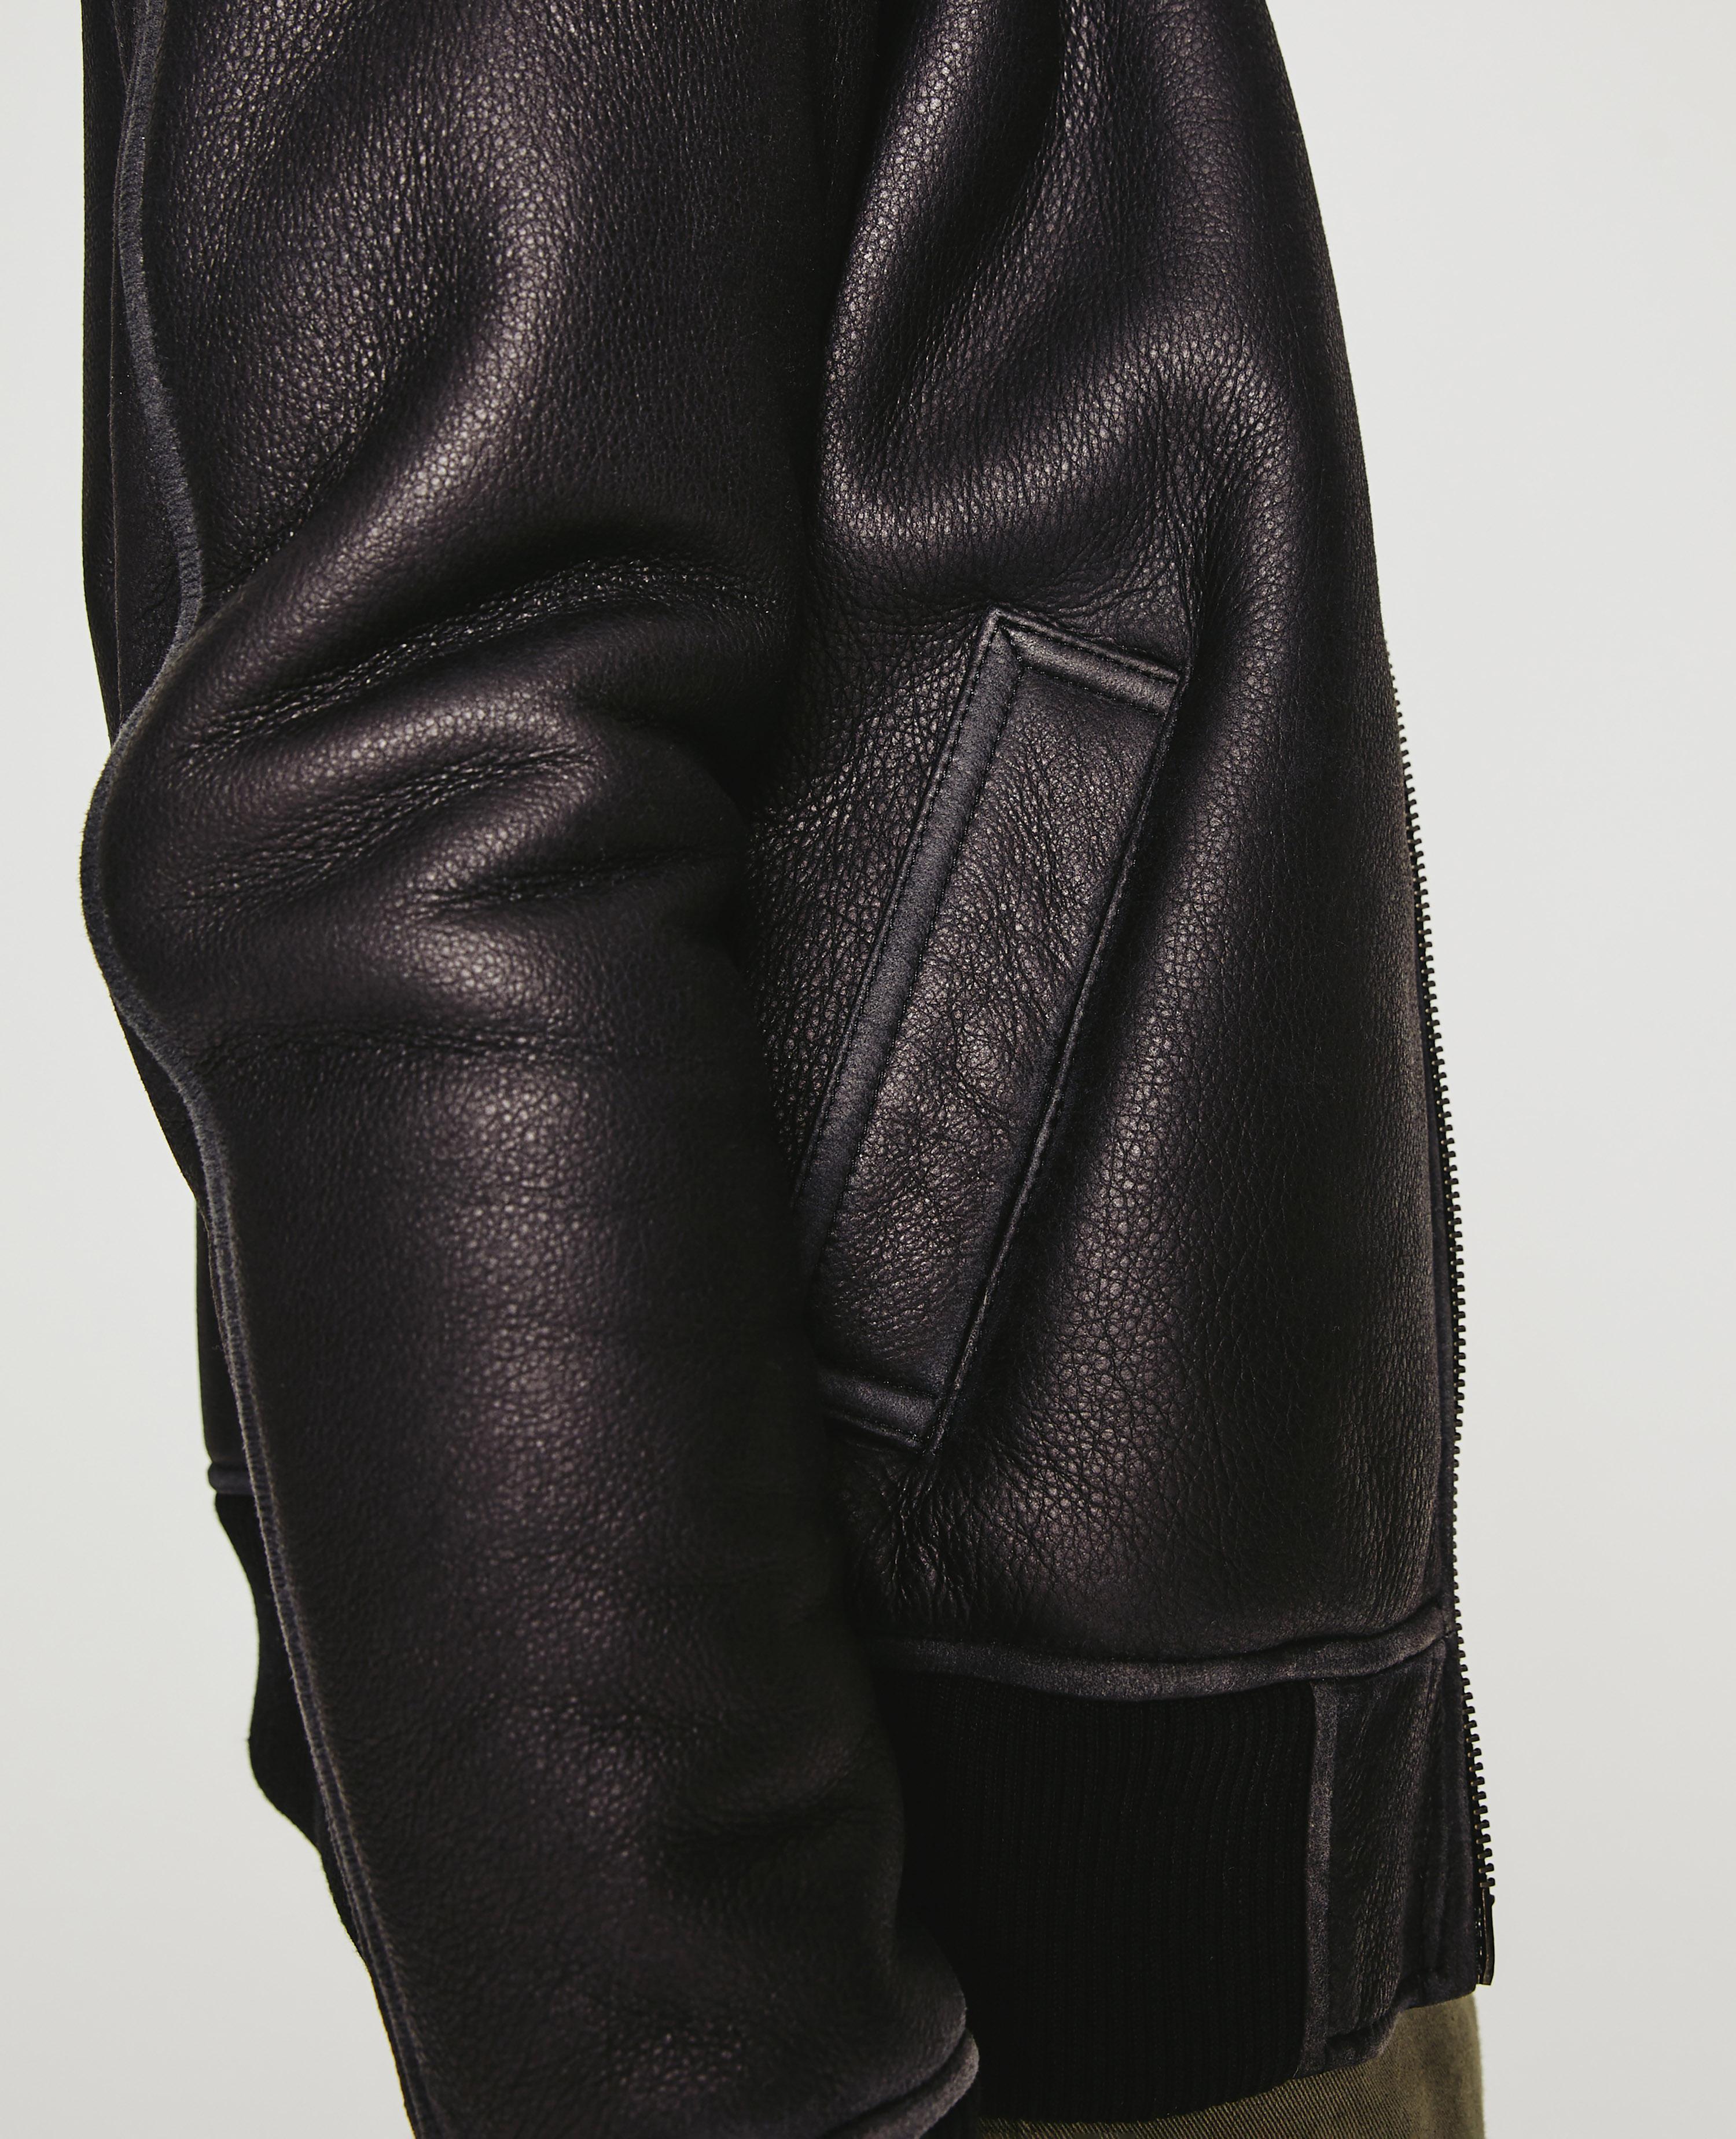 The Kane Shearling Coat